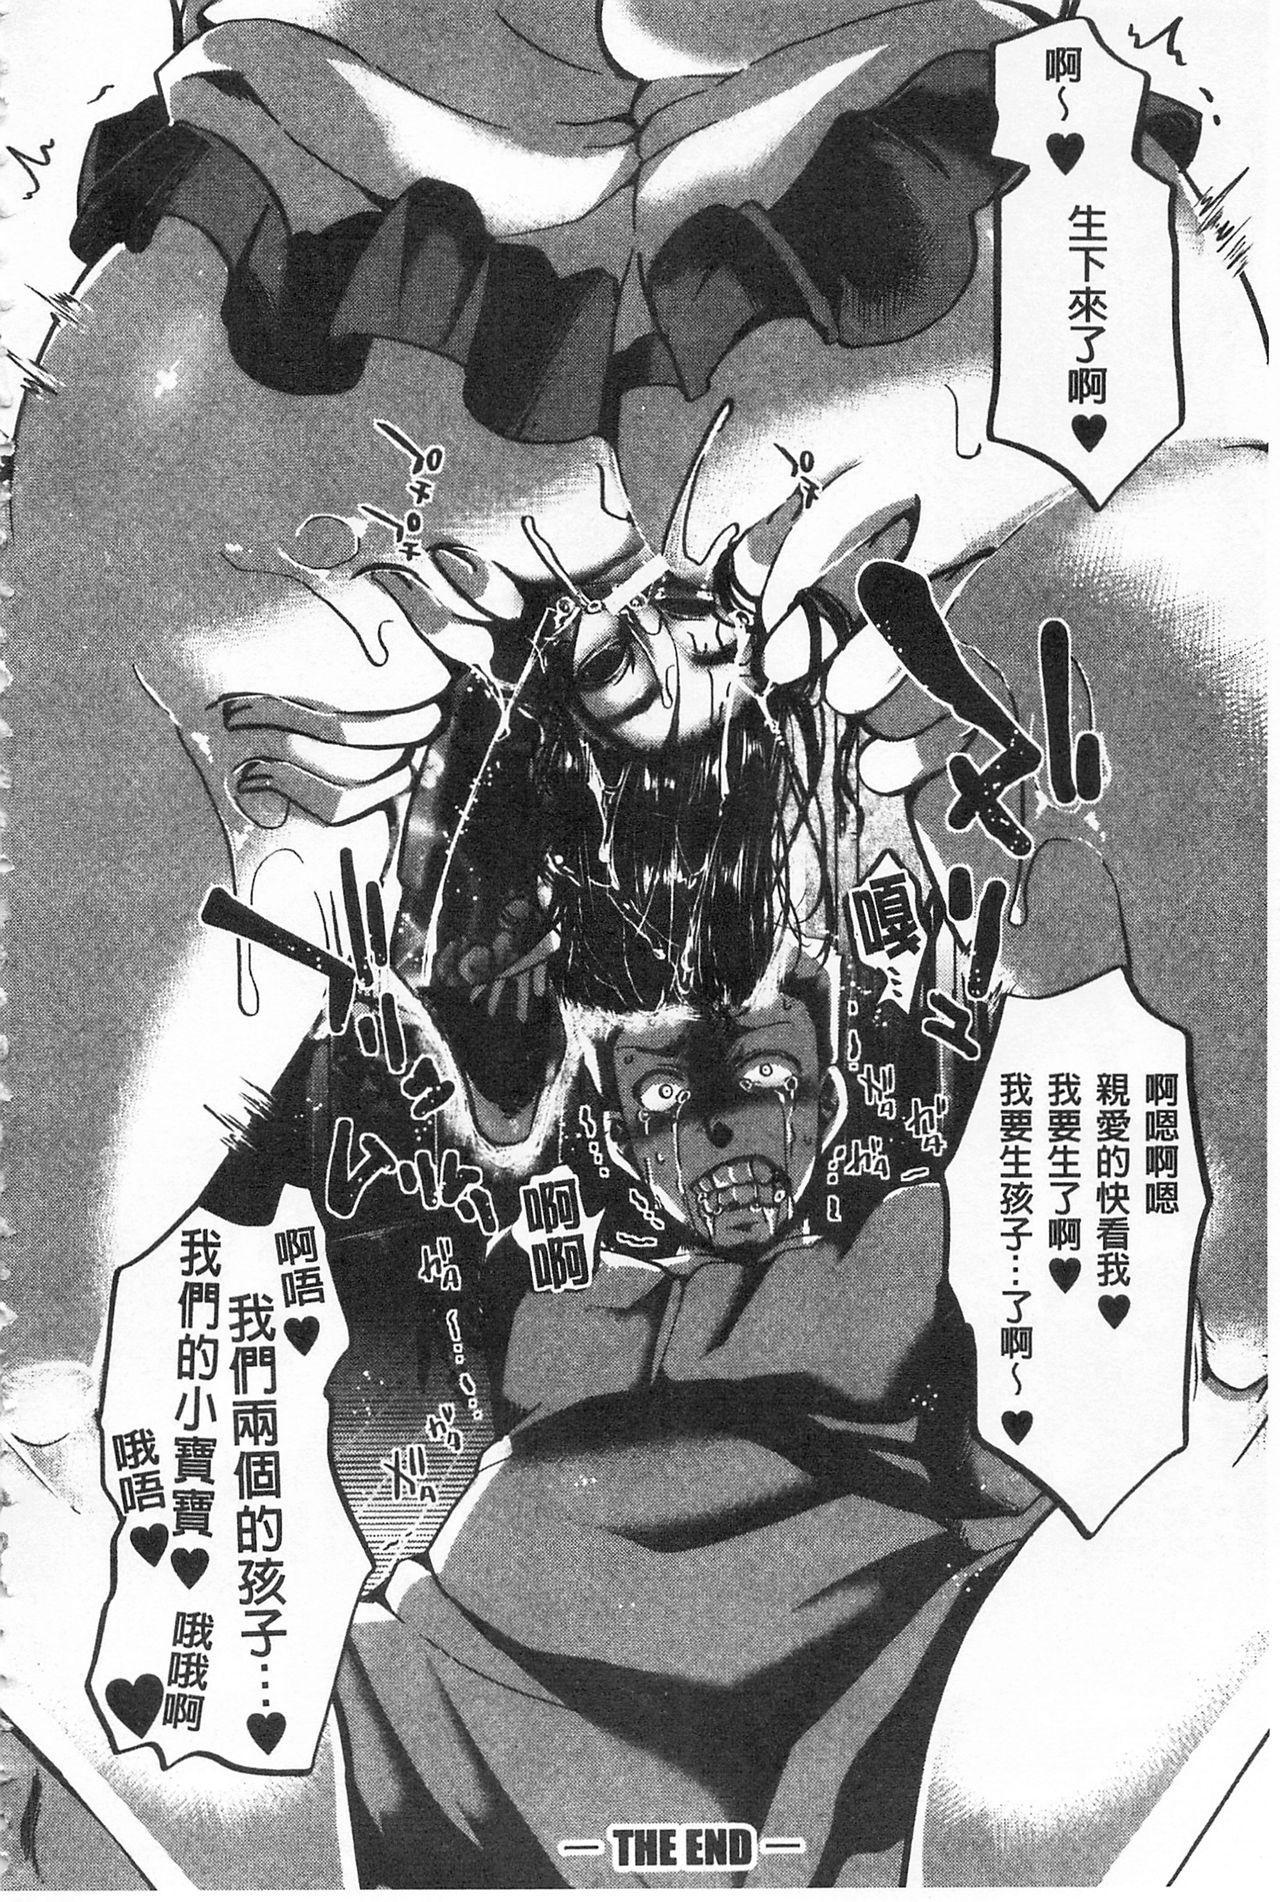 [hal] Daienjou -Ikare Ikasare Iki Ikare-   ∞艶嬢 -洩出來被搞到洩掛了被搞掛-  [Chinese] 63